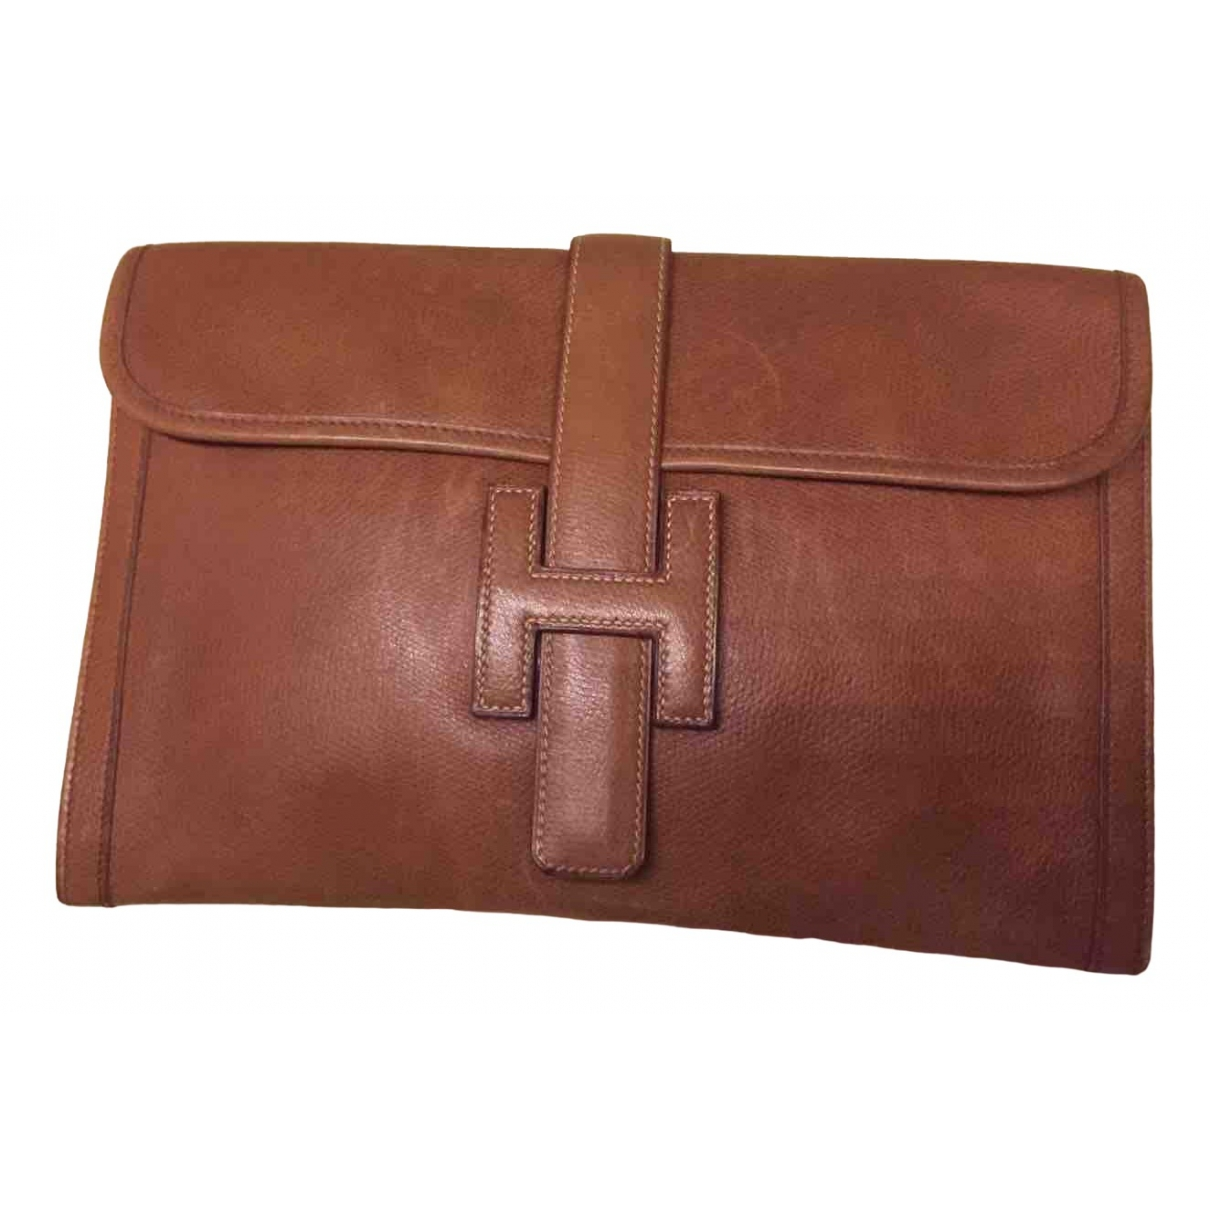 Hermès Jige Camel Leather Clutch bag for Women \N